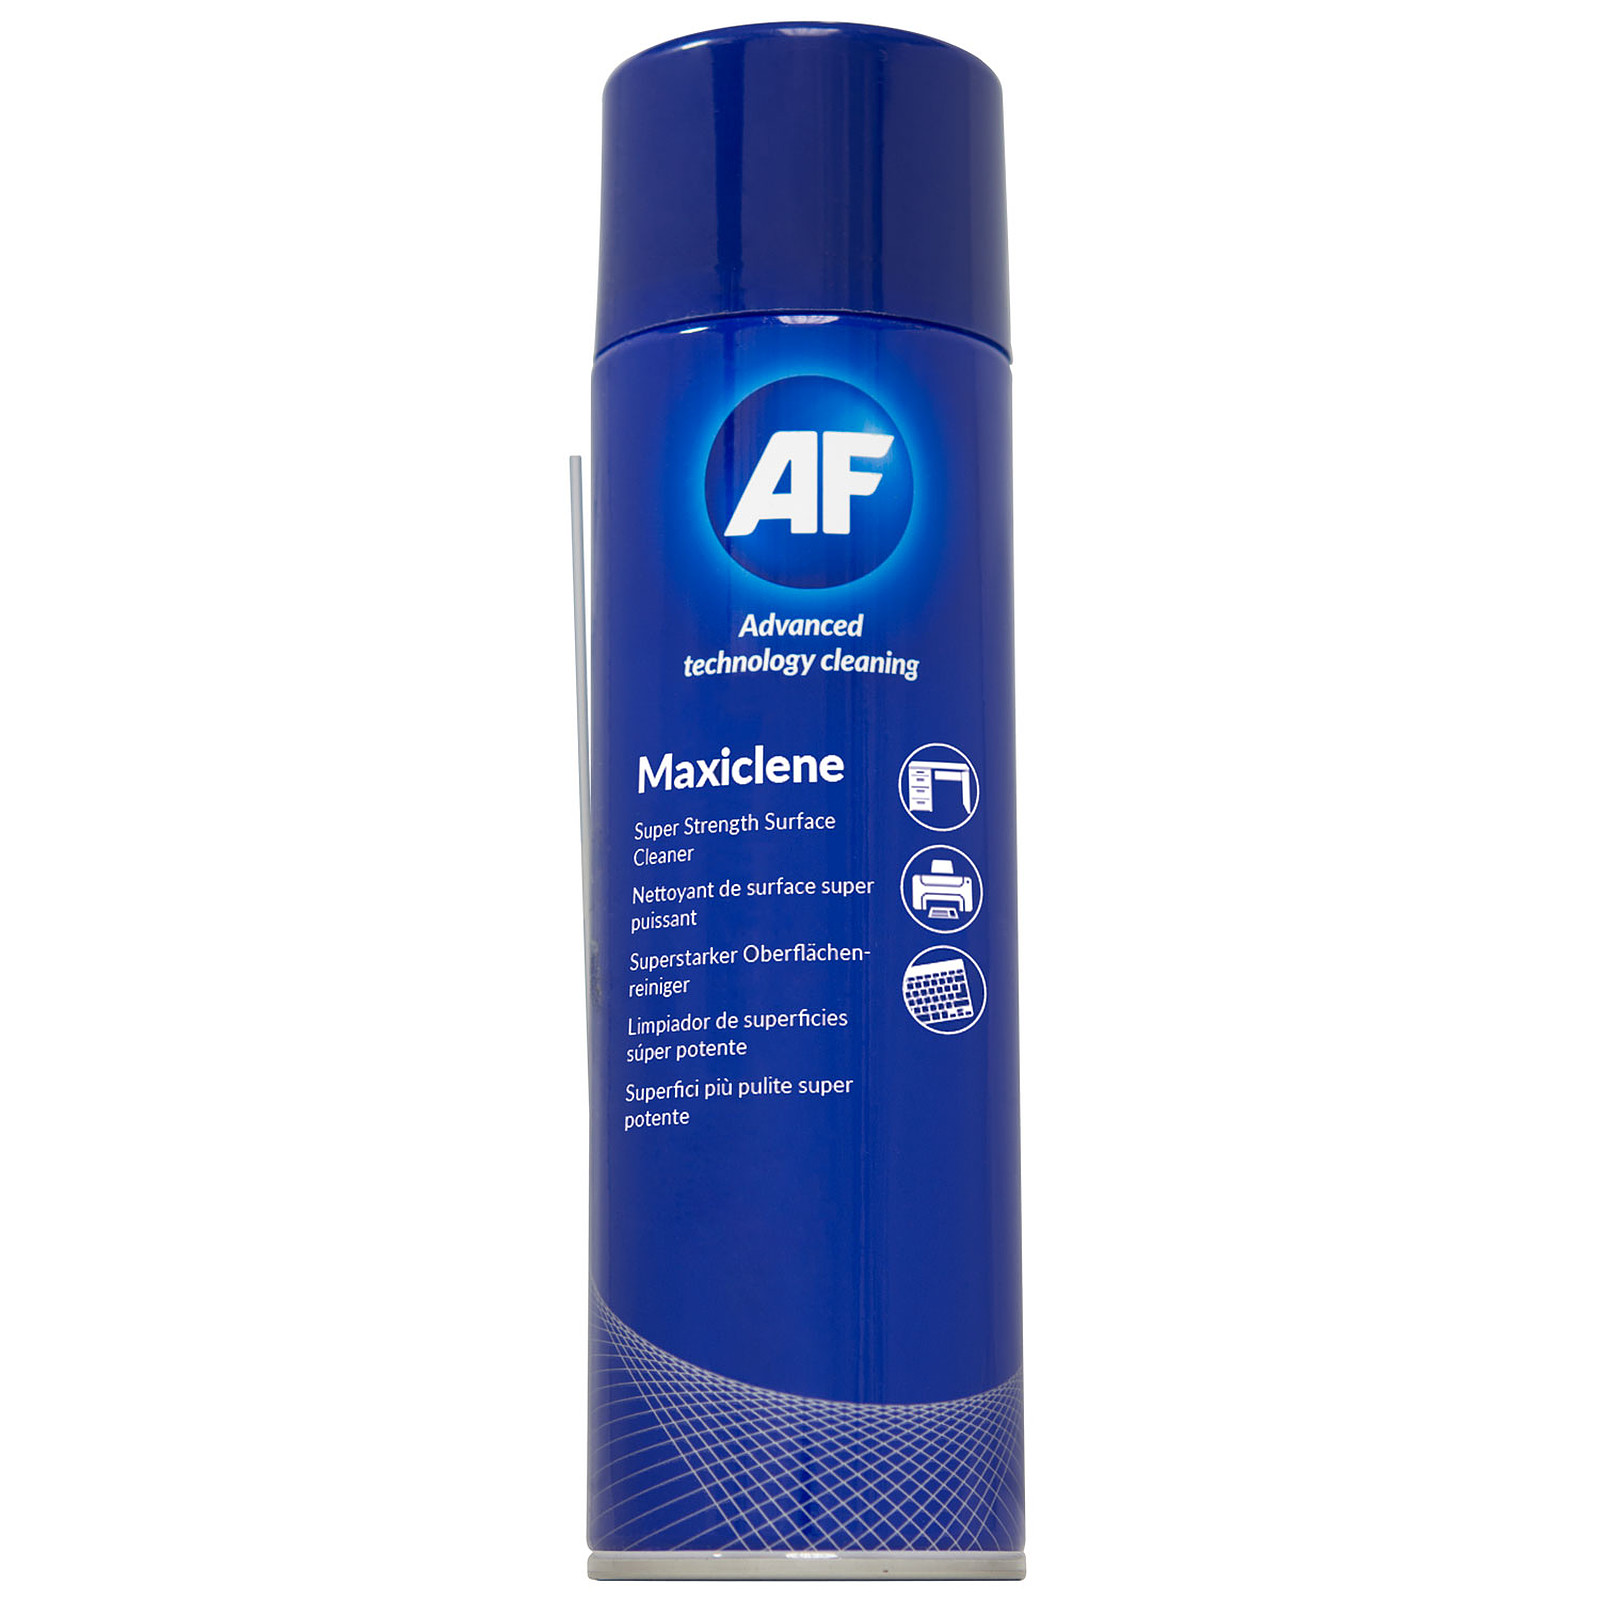 AF Maxiclene (MXL400)